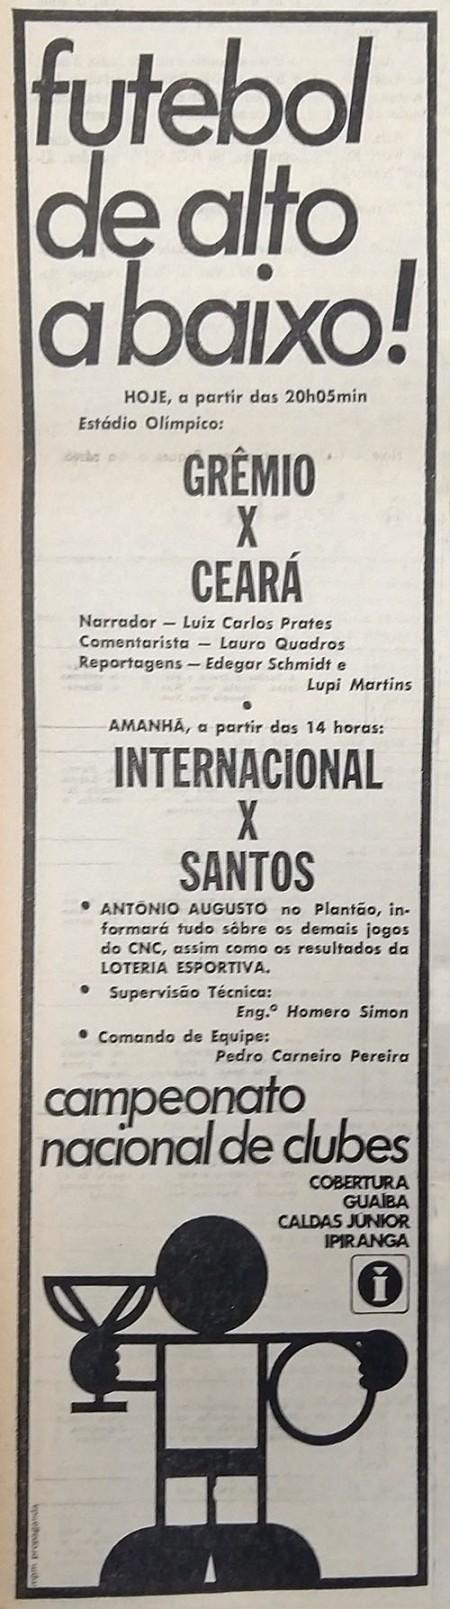 1971 Ceara guaiba